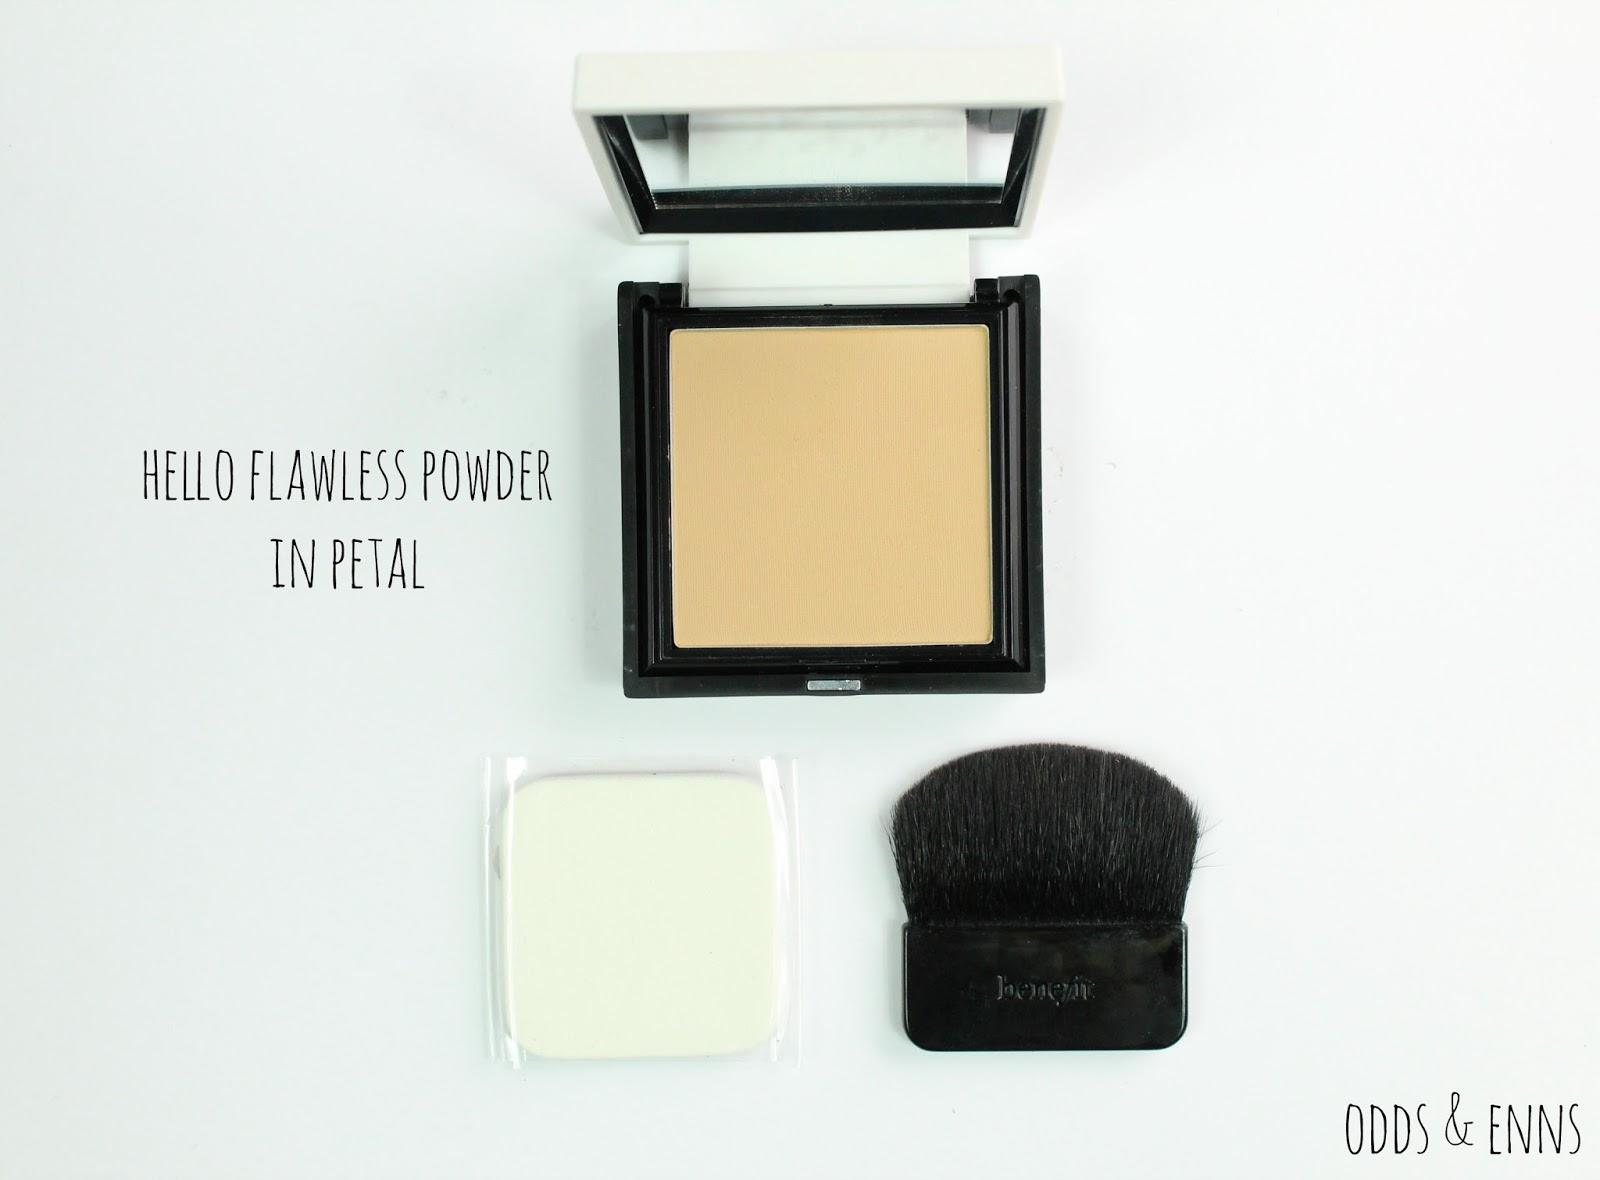 Benefit Hello Flawless Powder Petal Review